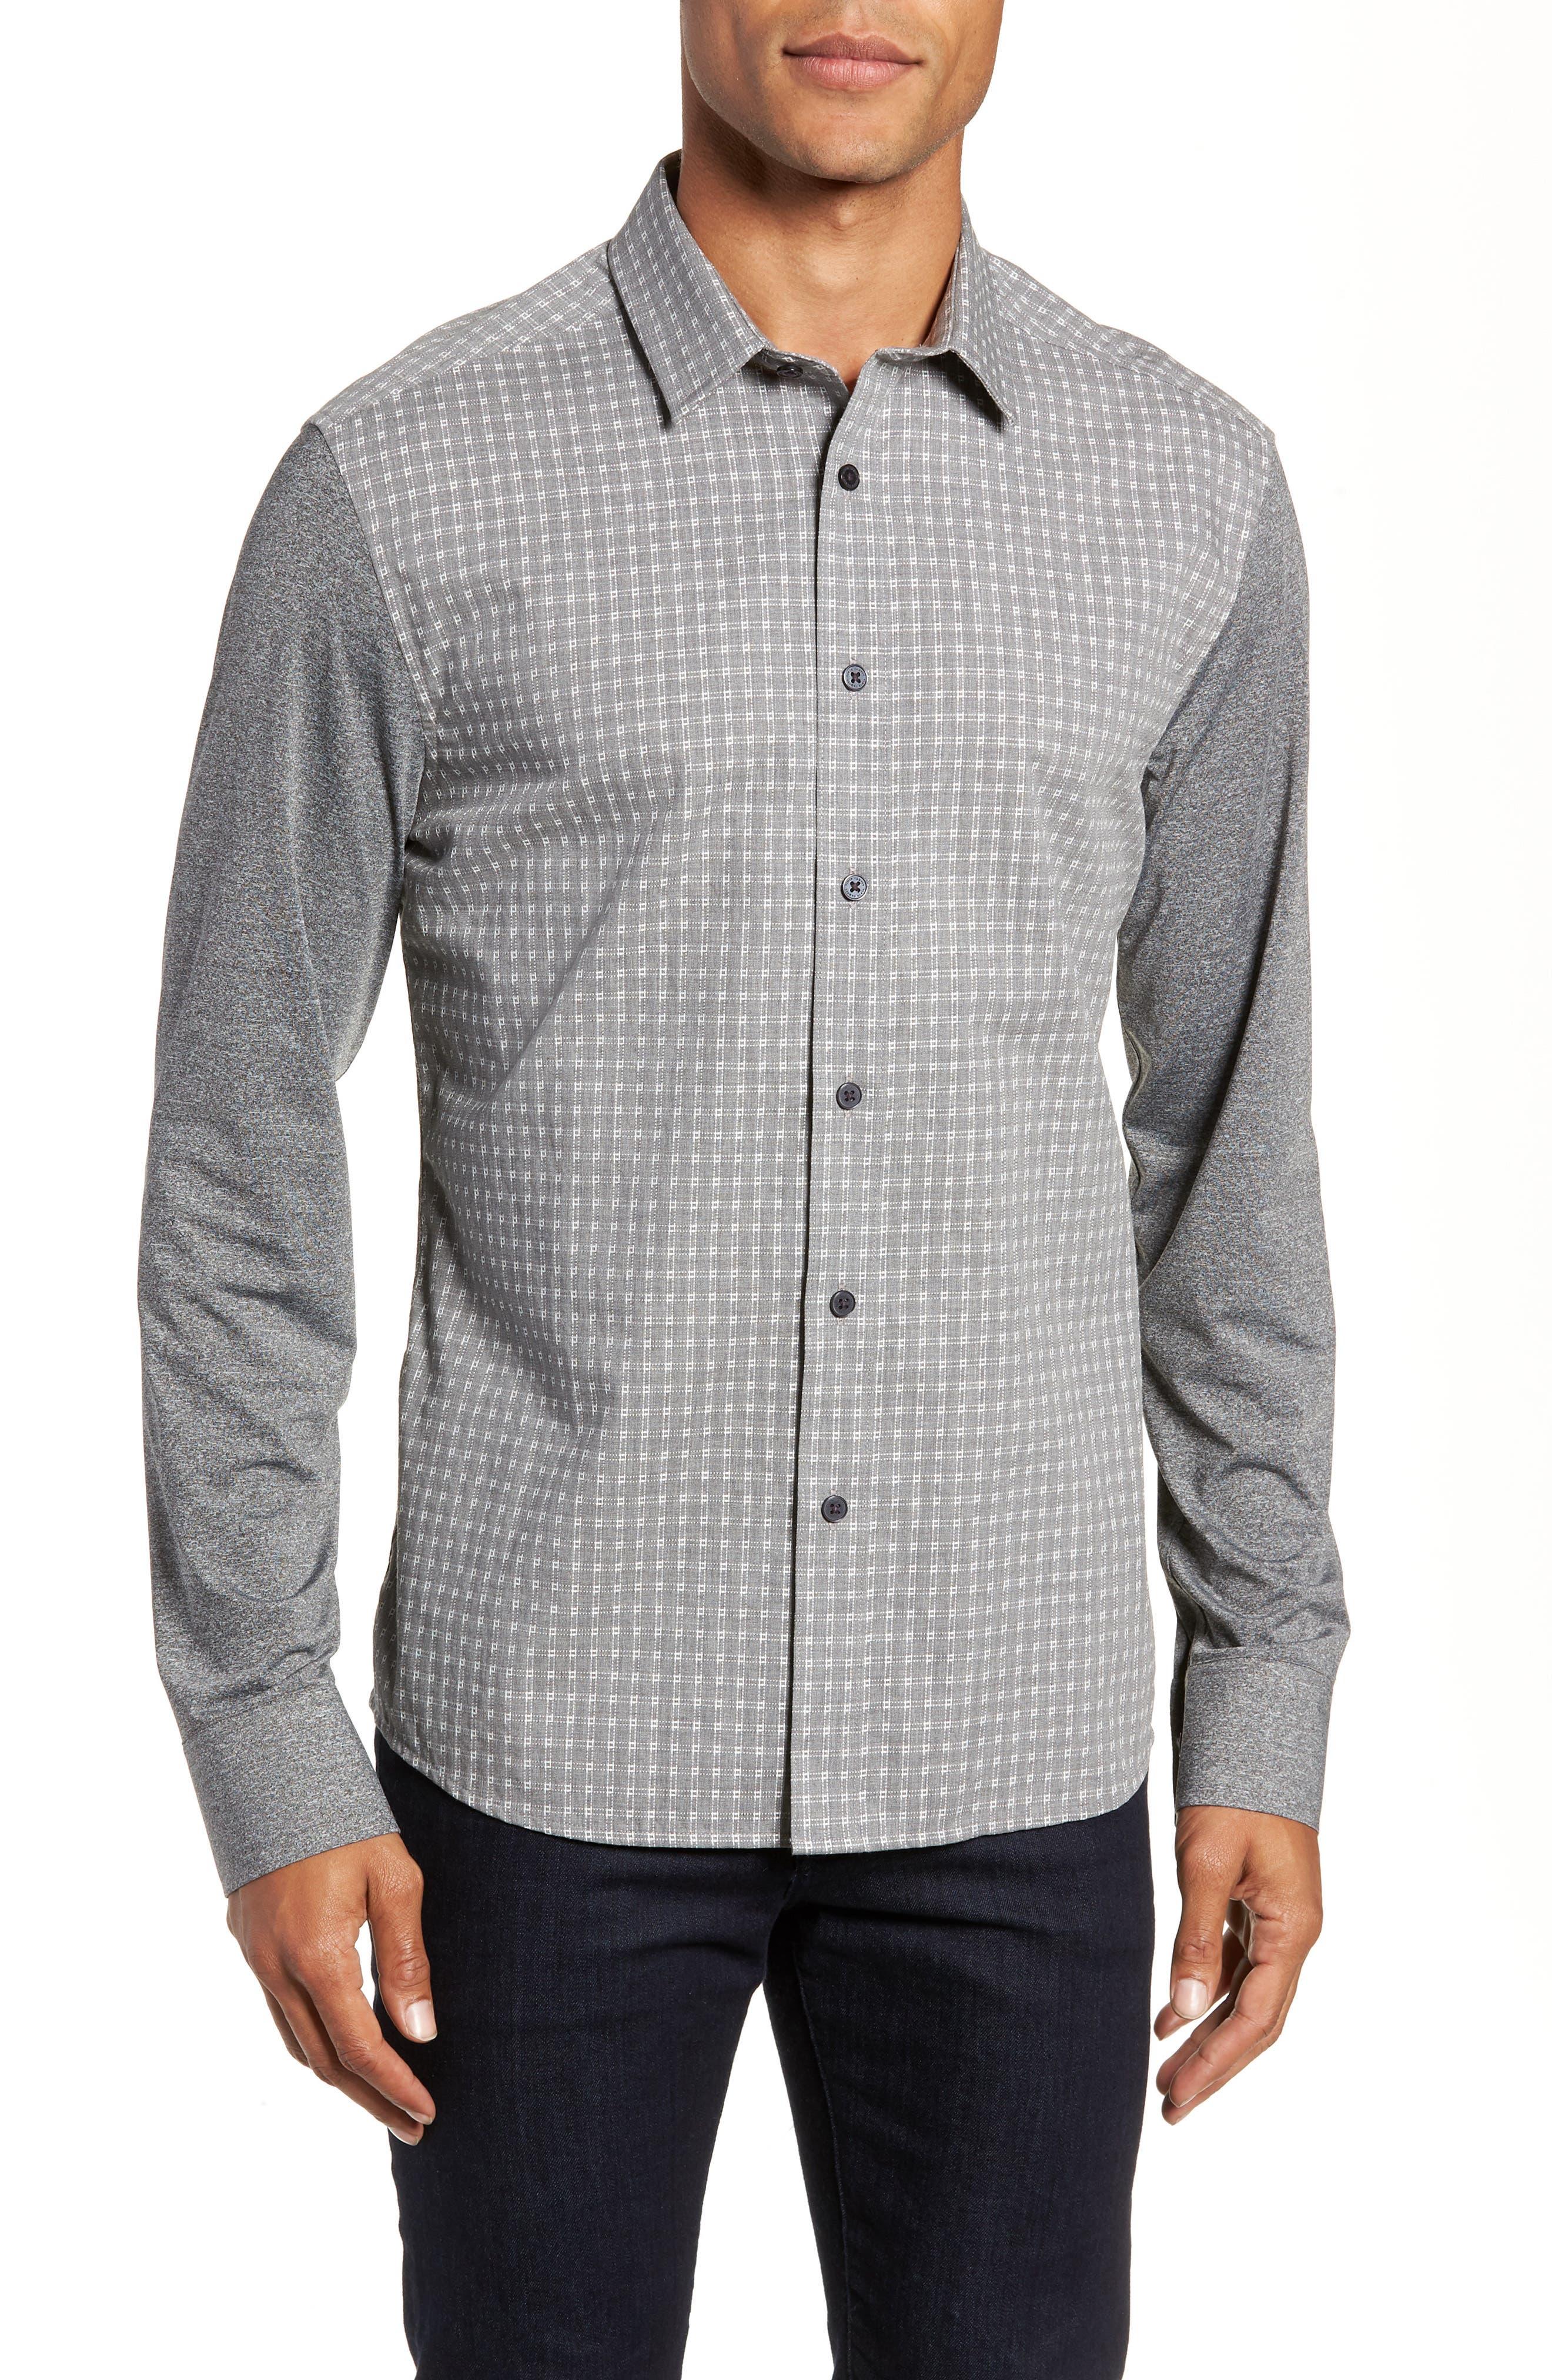 VINCE CAMUTO,                             Slim Fit Mixed Media Sport Shirt,                             Main thumbnail 1, color,                             034